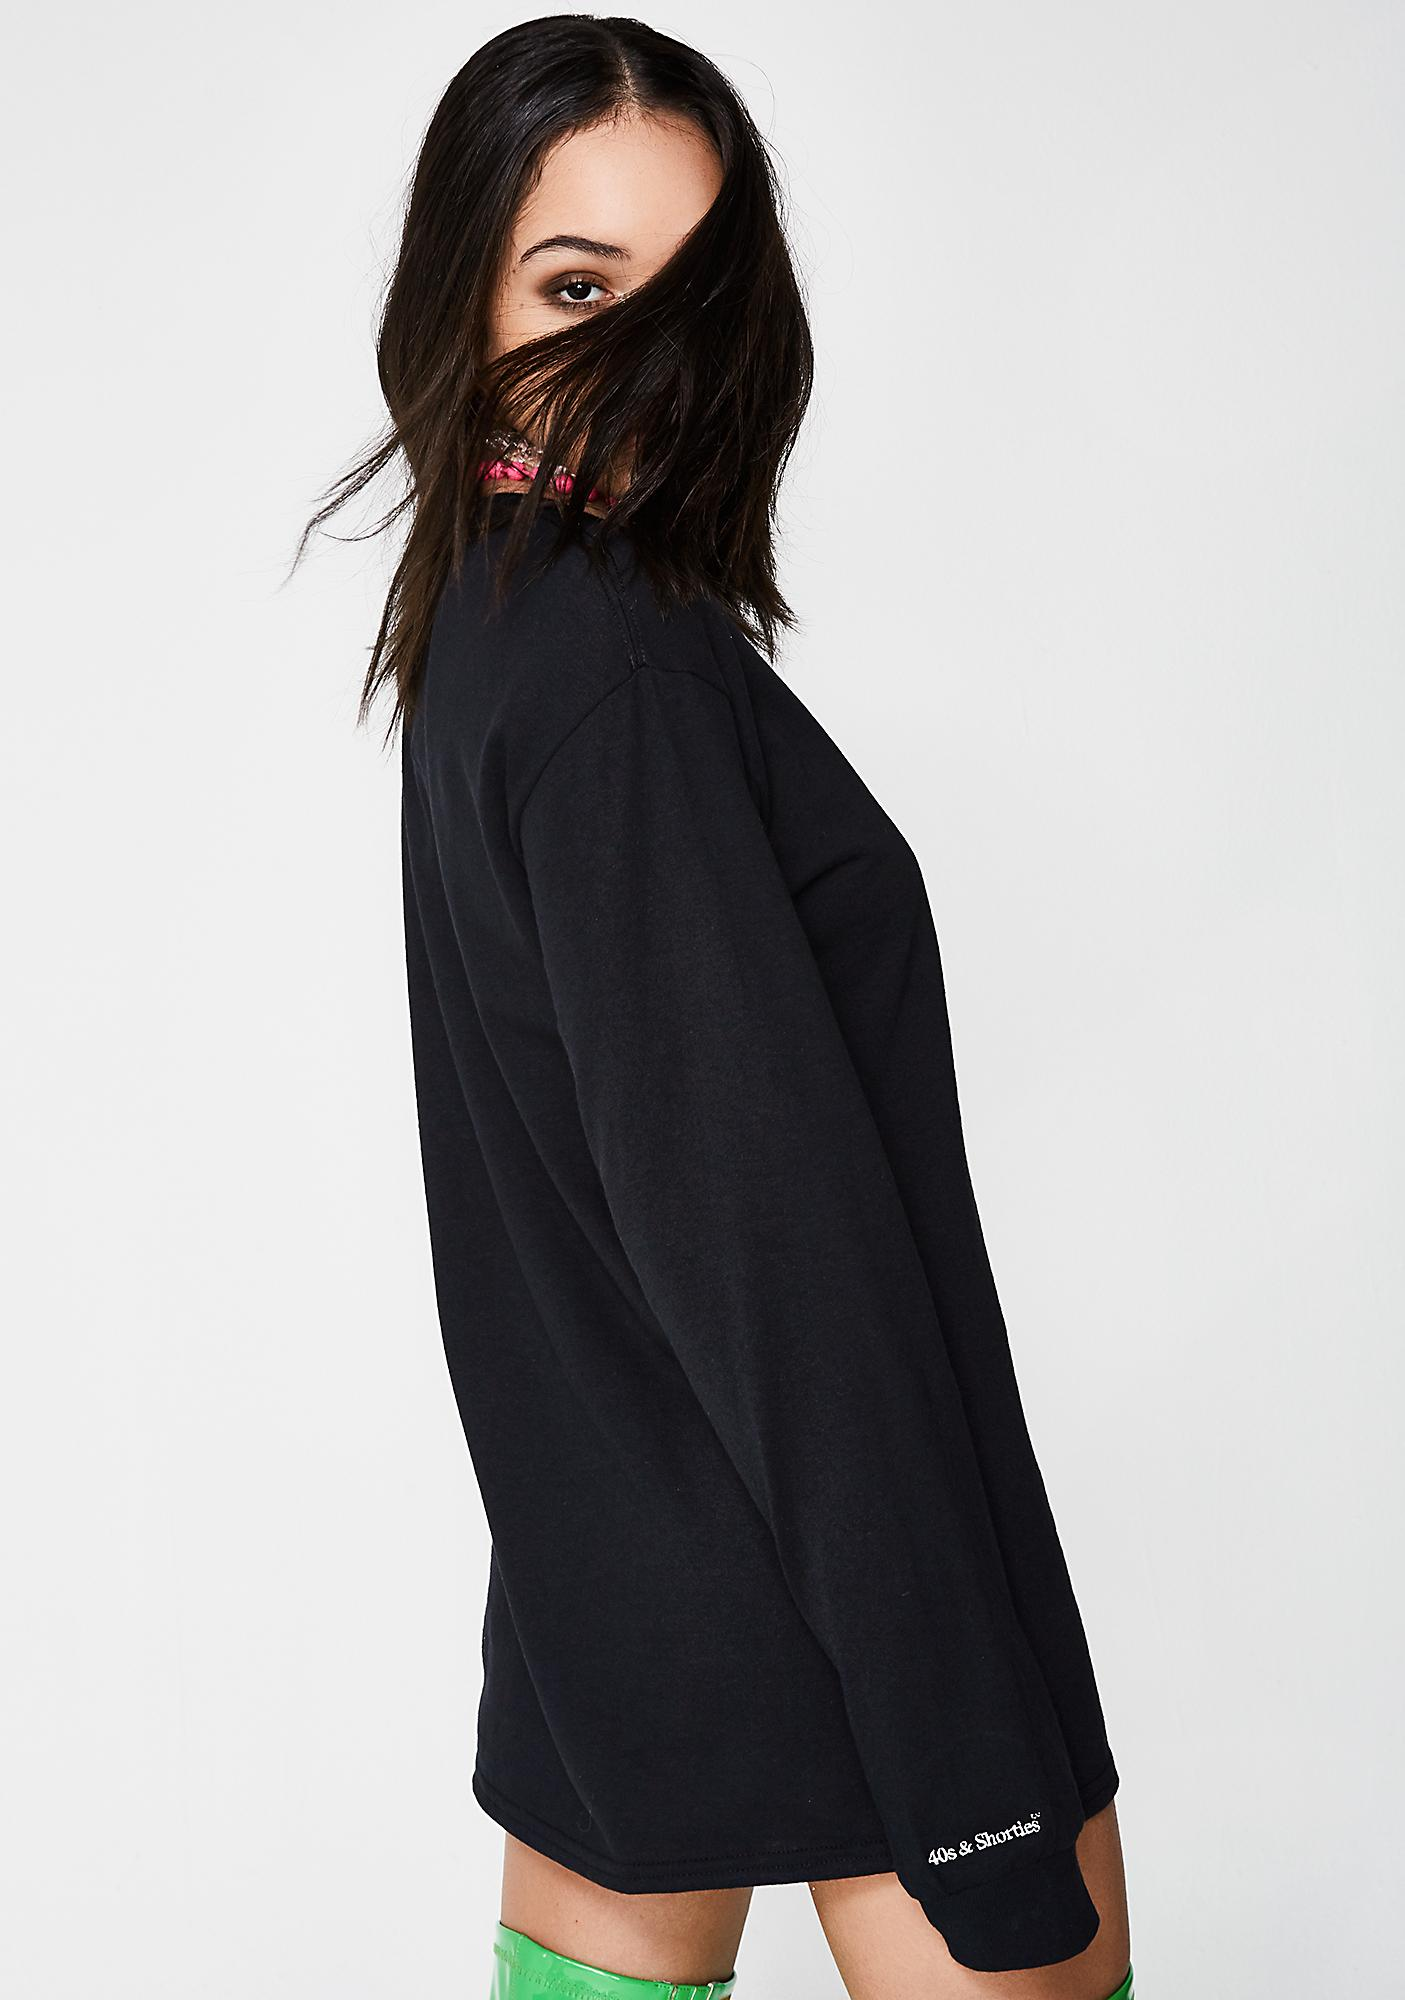 40s & Shorties Midnight Hustler Embroidered Pocket Long Sleeve